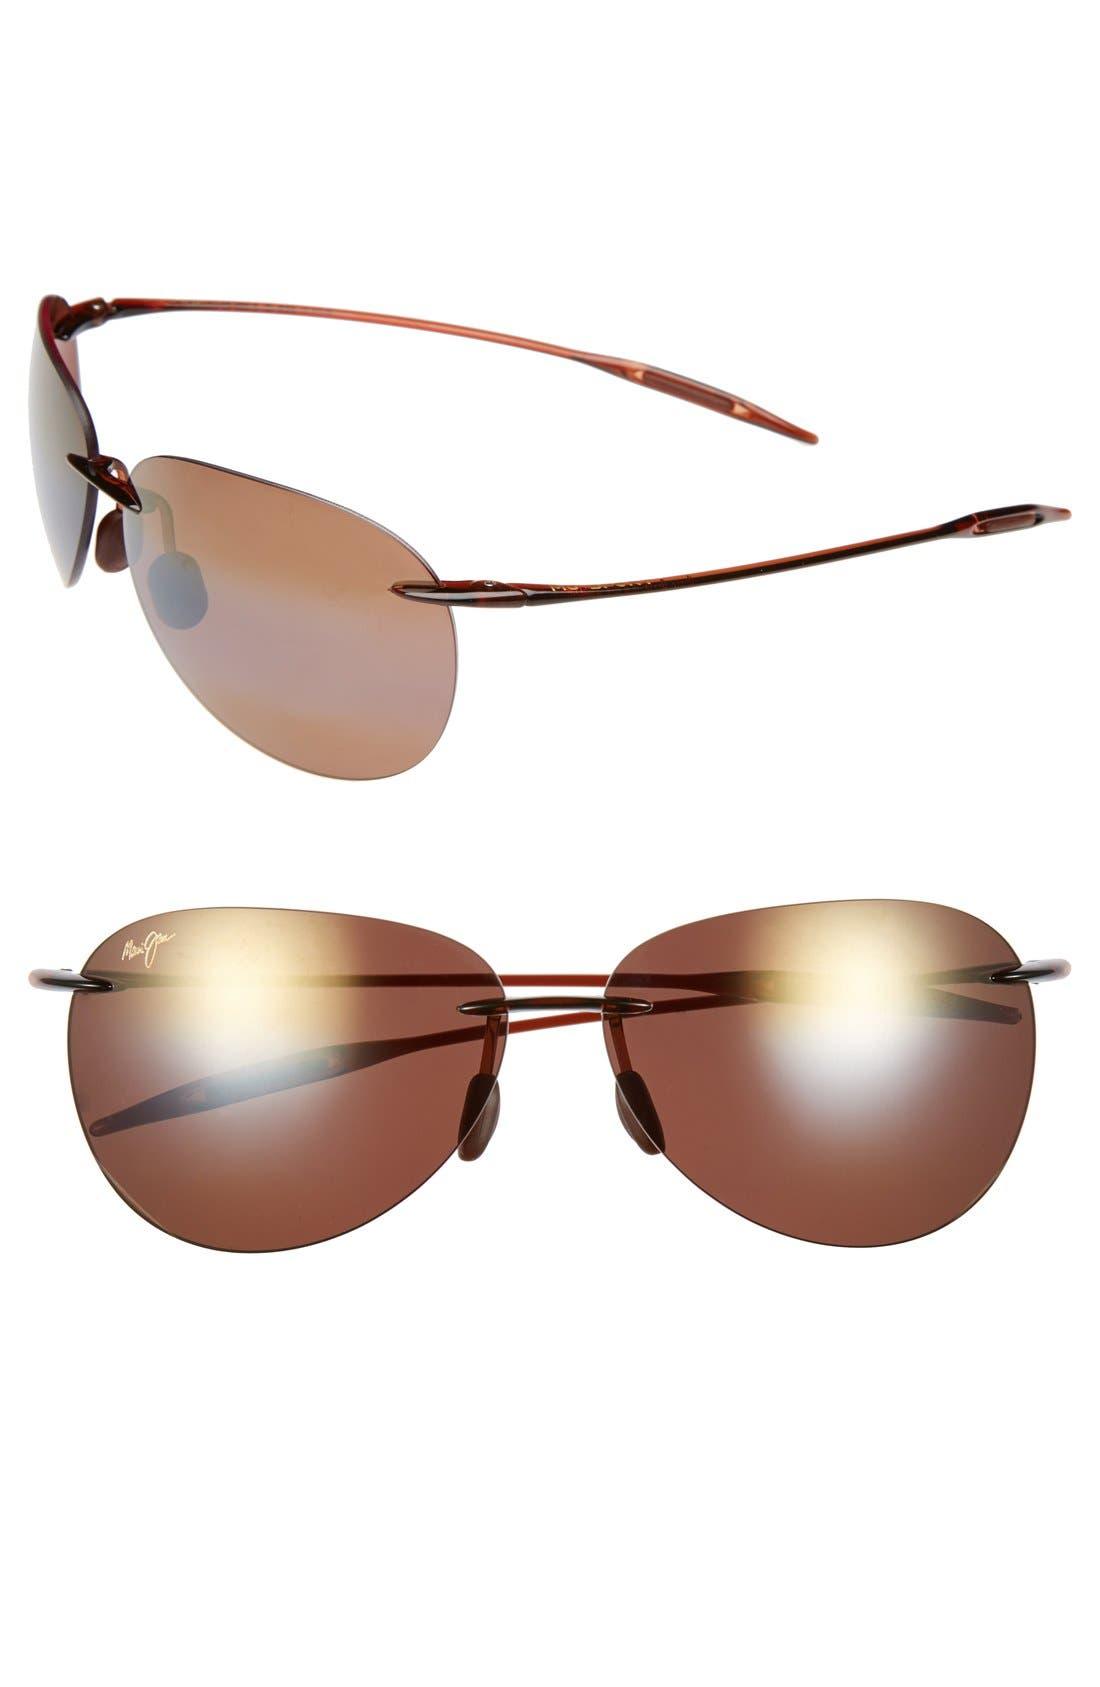 Sugar Beach 62mm Polarizedplus2 Rimless Sunglasses